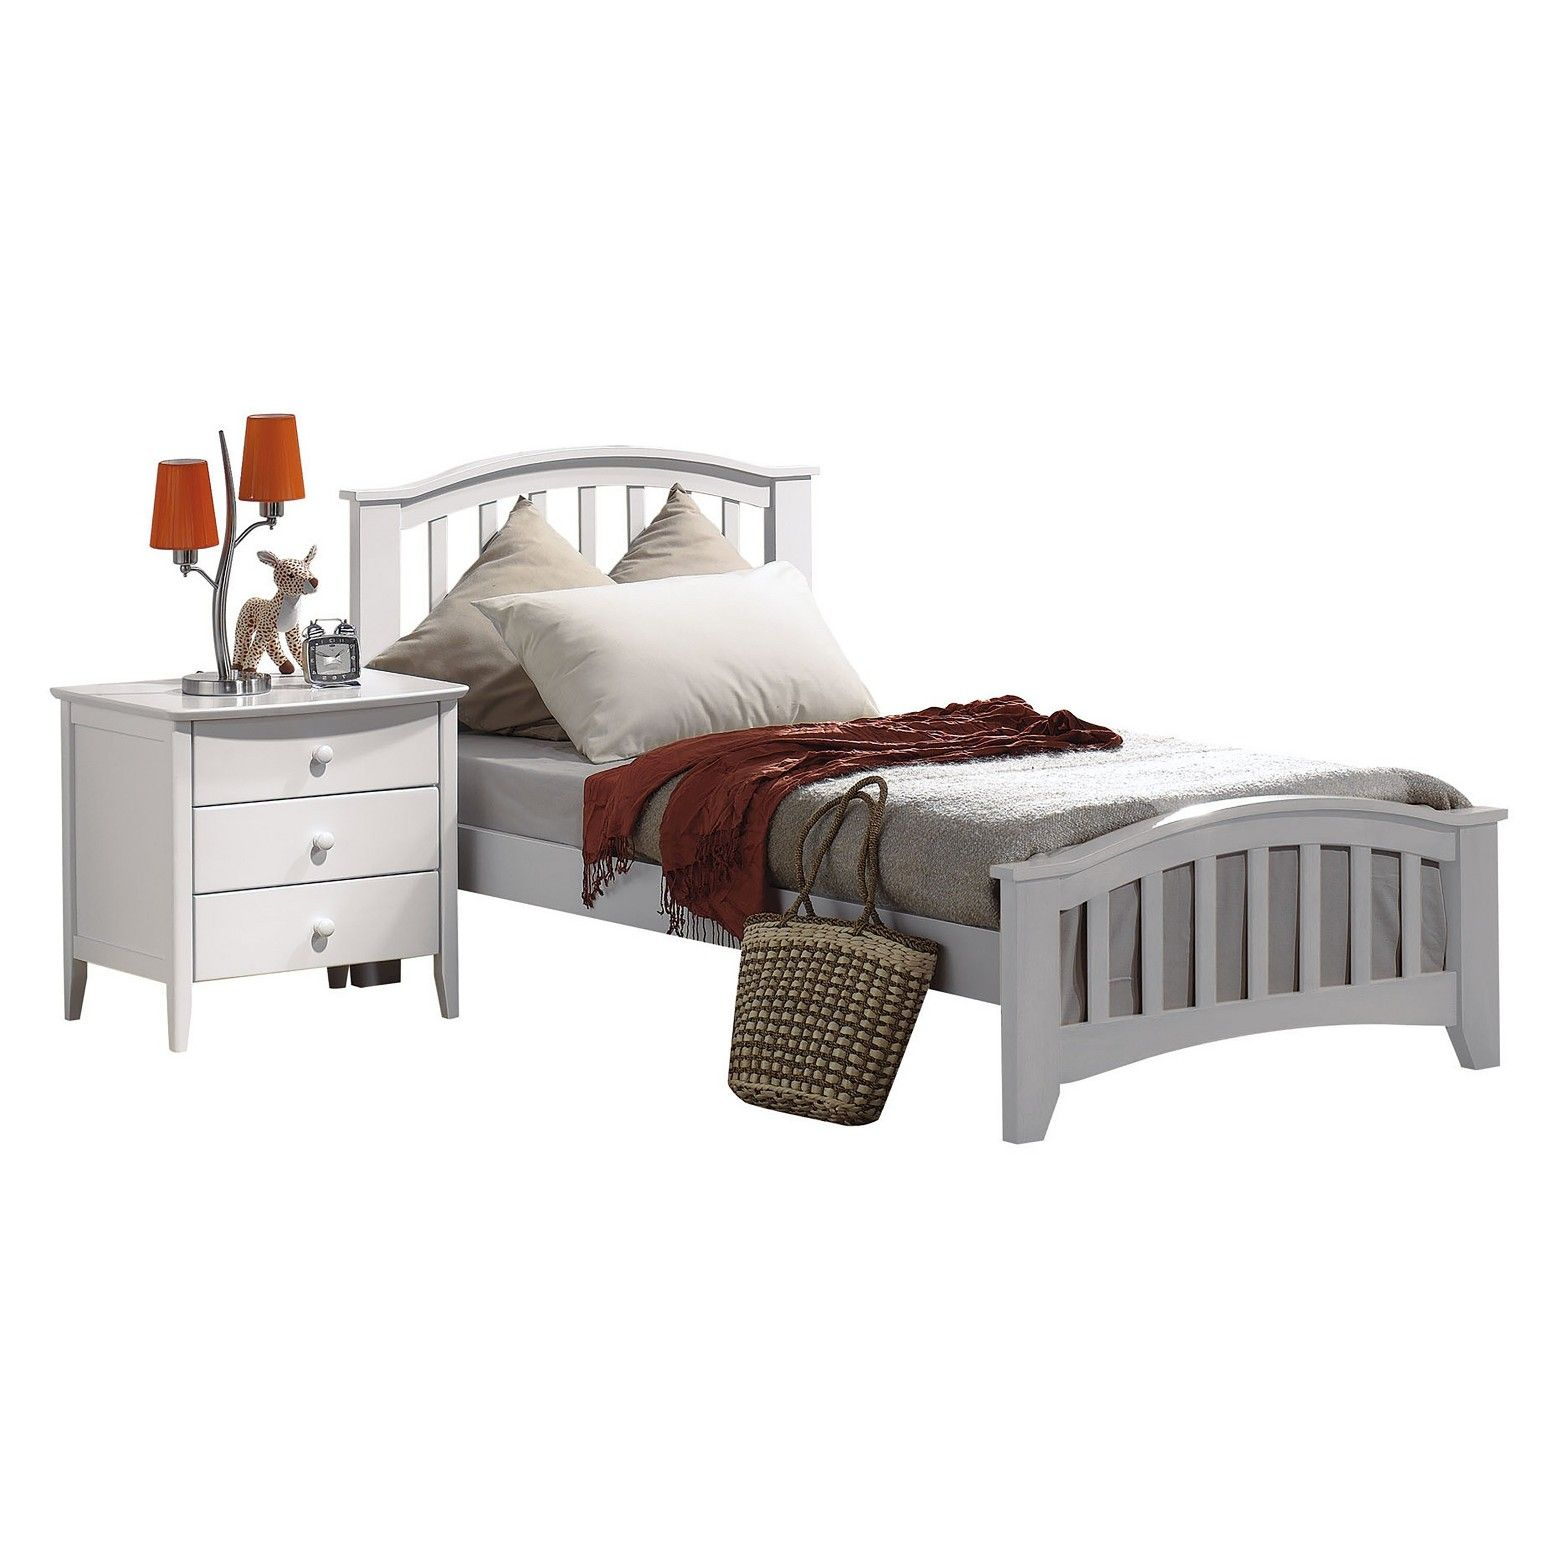 San Marino Kids Bed - White(Twin) - Acme